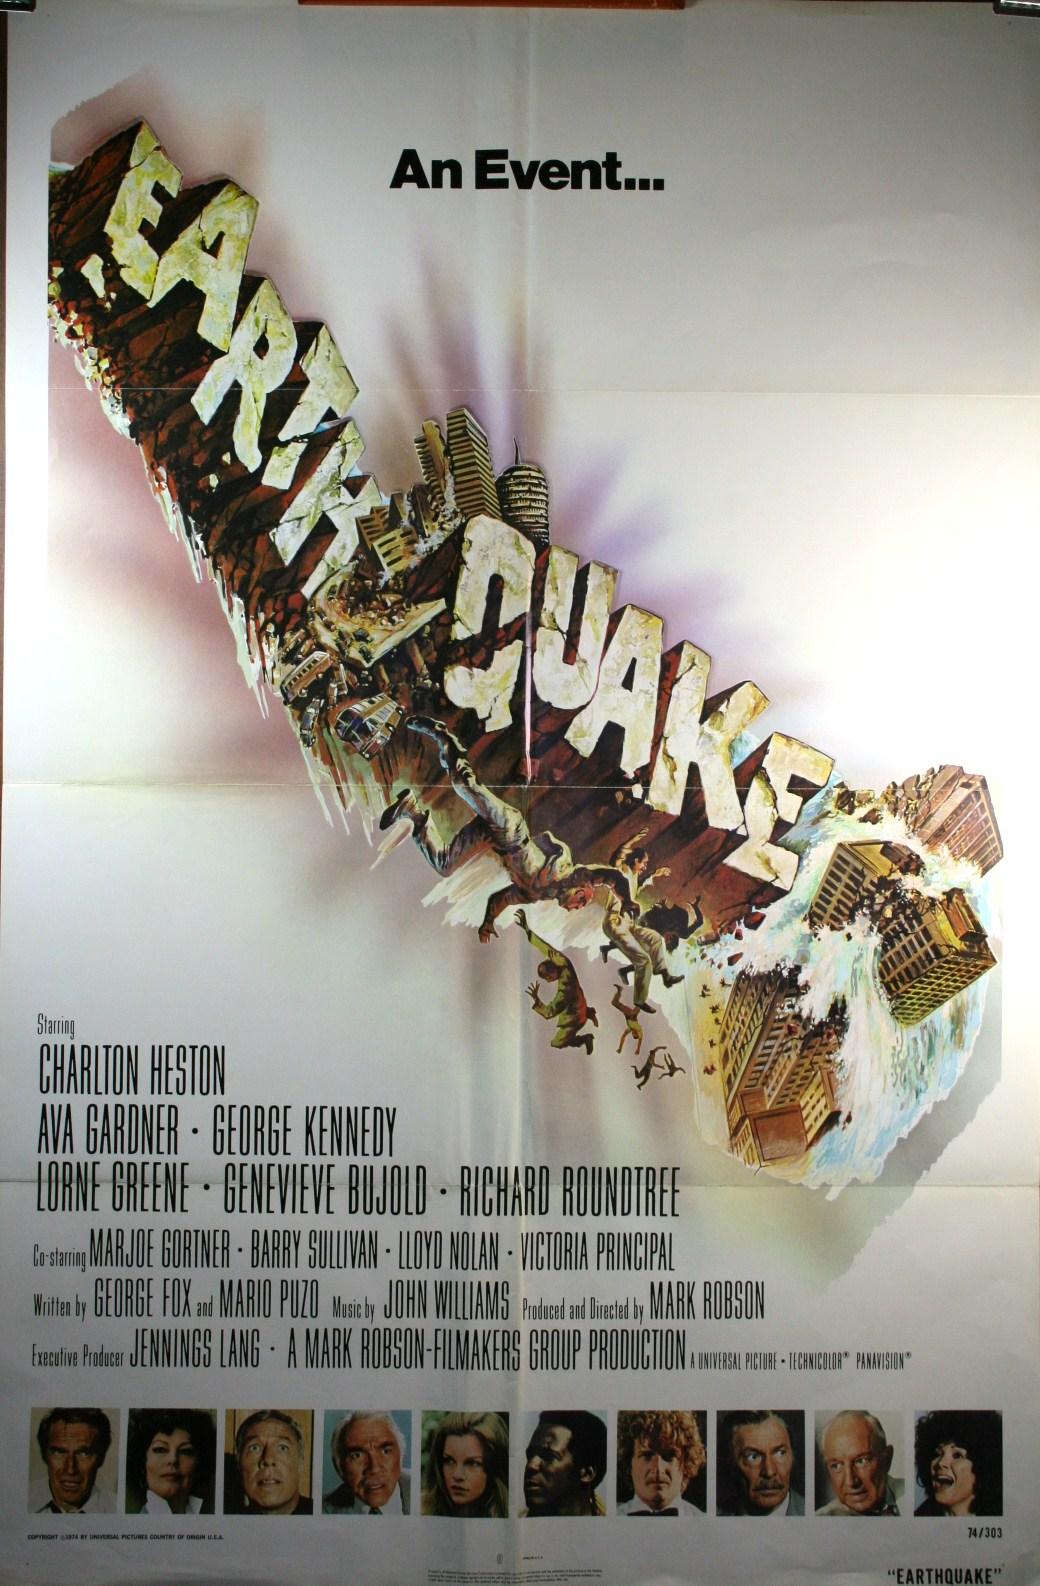 Earthquake 1 Sheet Movie Poster